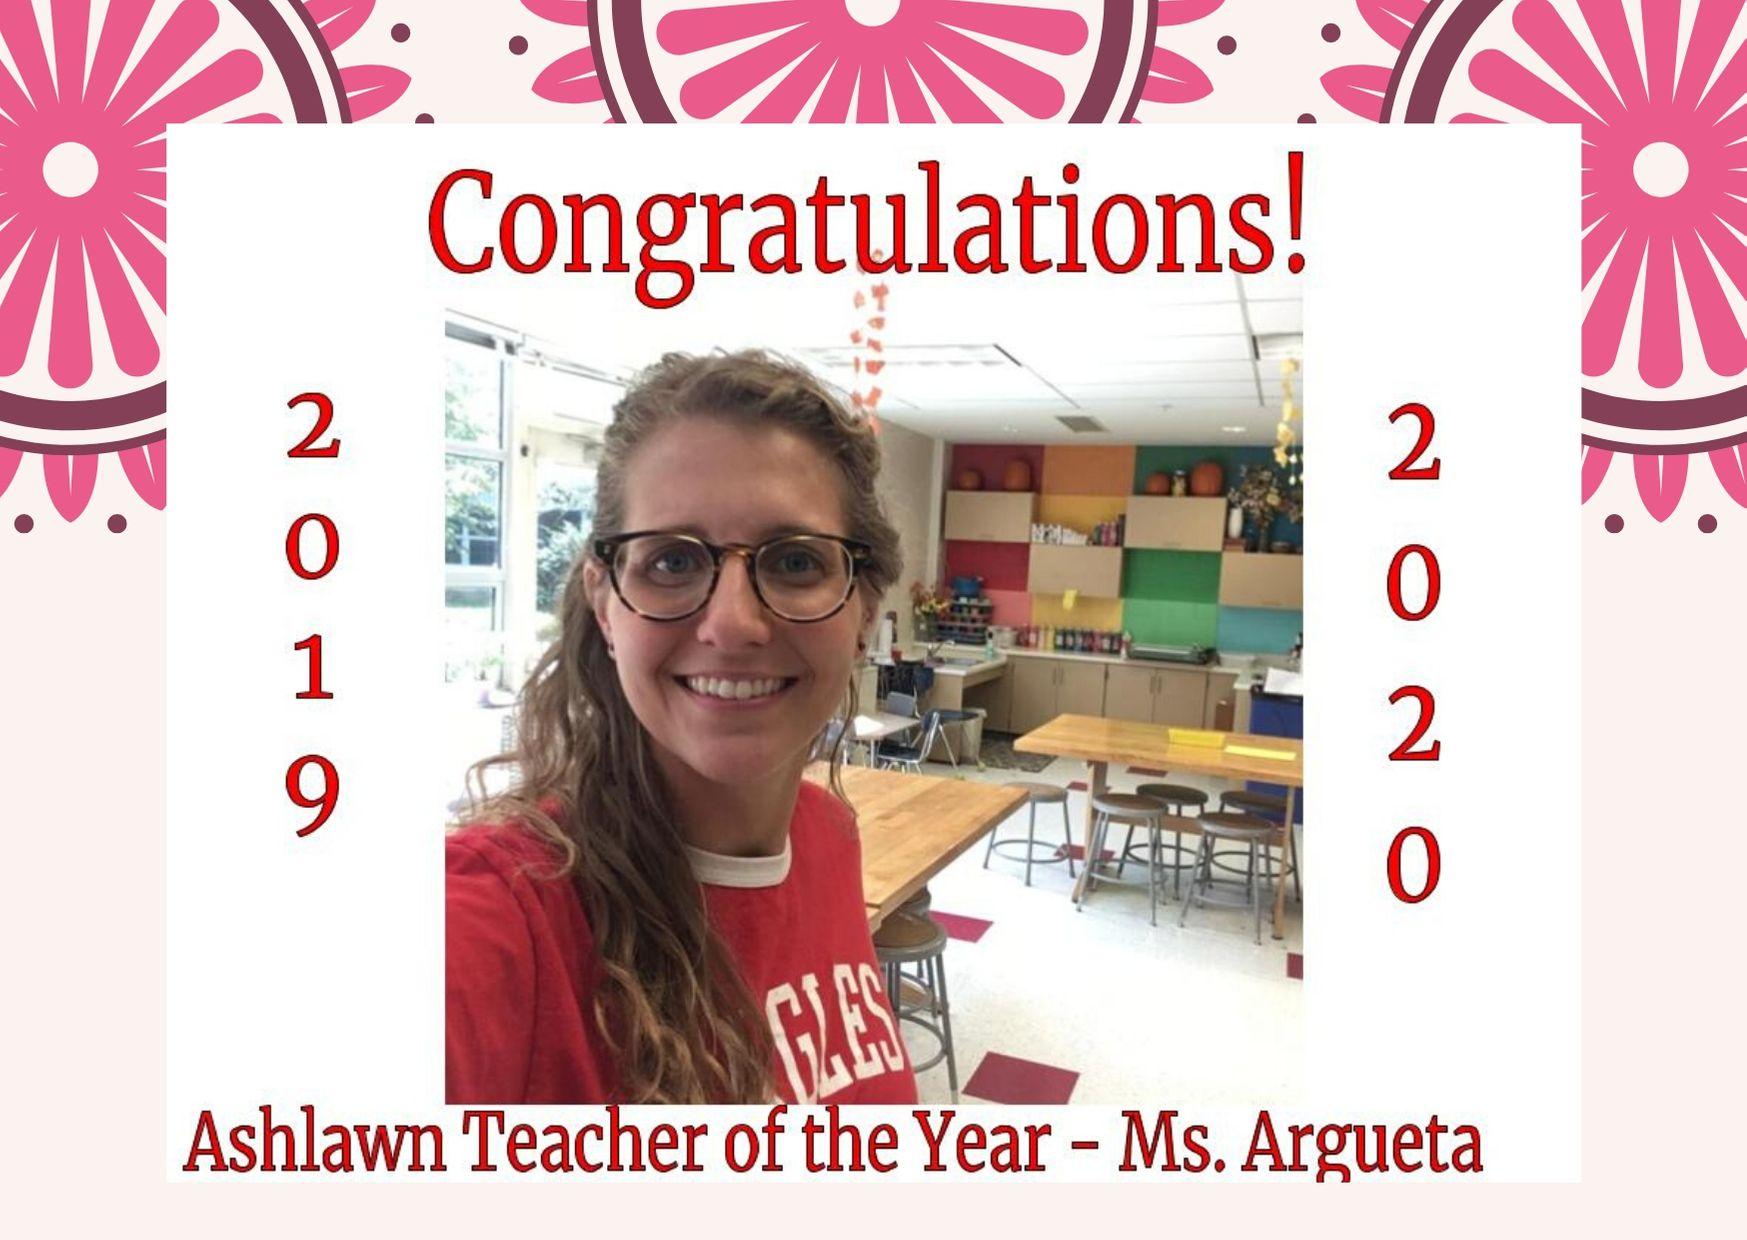 Ashlawn Teacher of The Year ~ Ms. Argueta